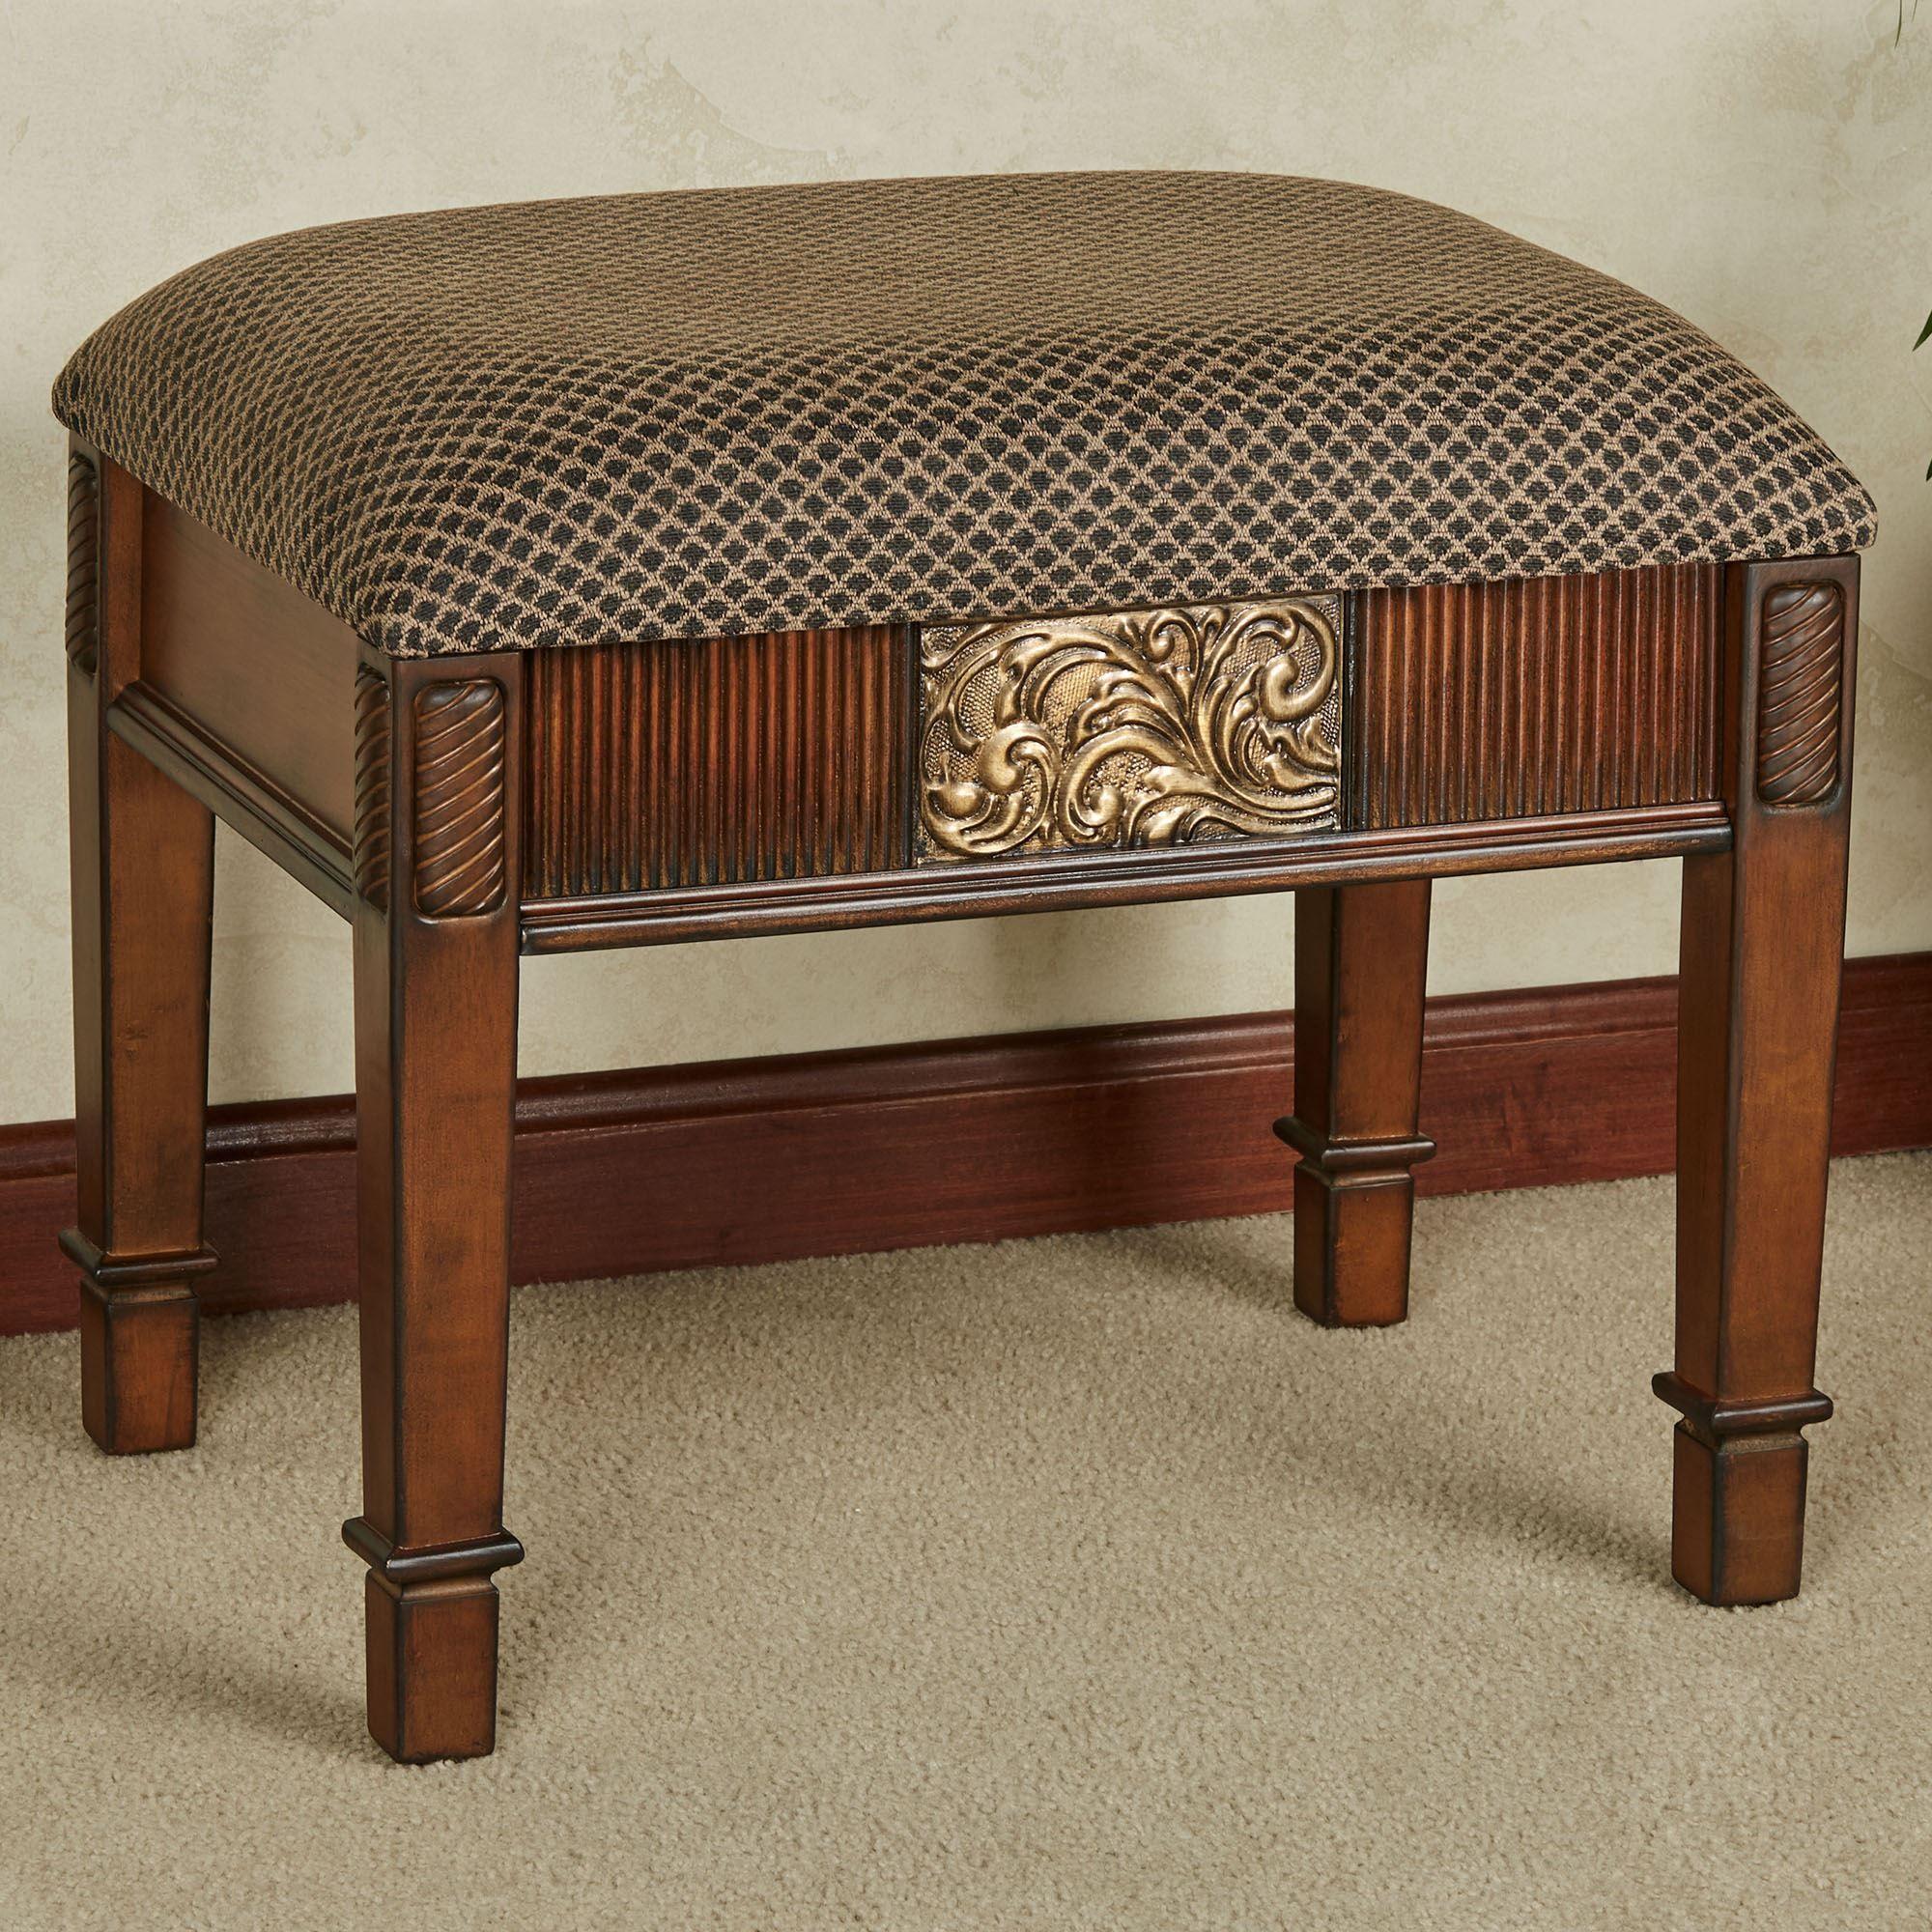 Pleasing Sarantino Vanity Bench Spiritservingveterans Wood Chair Design Ideas Spiritservingveteransorg